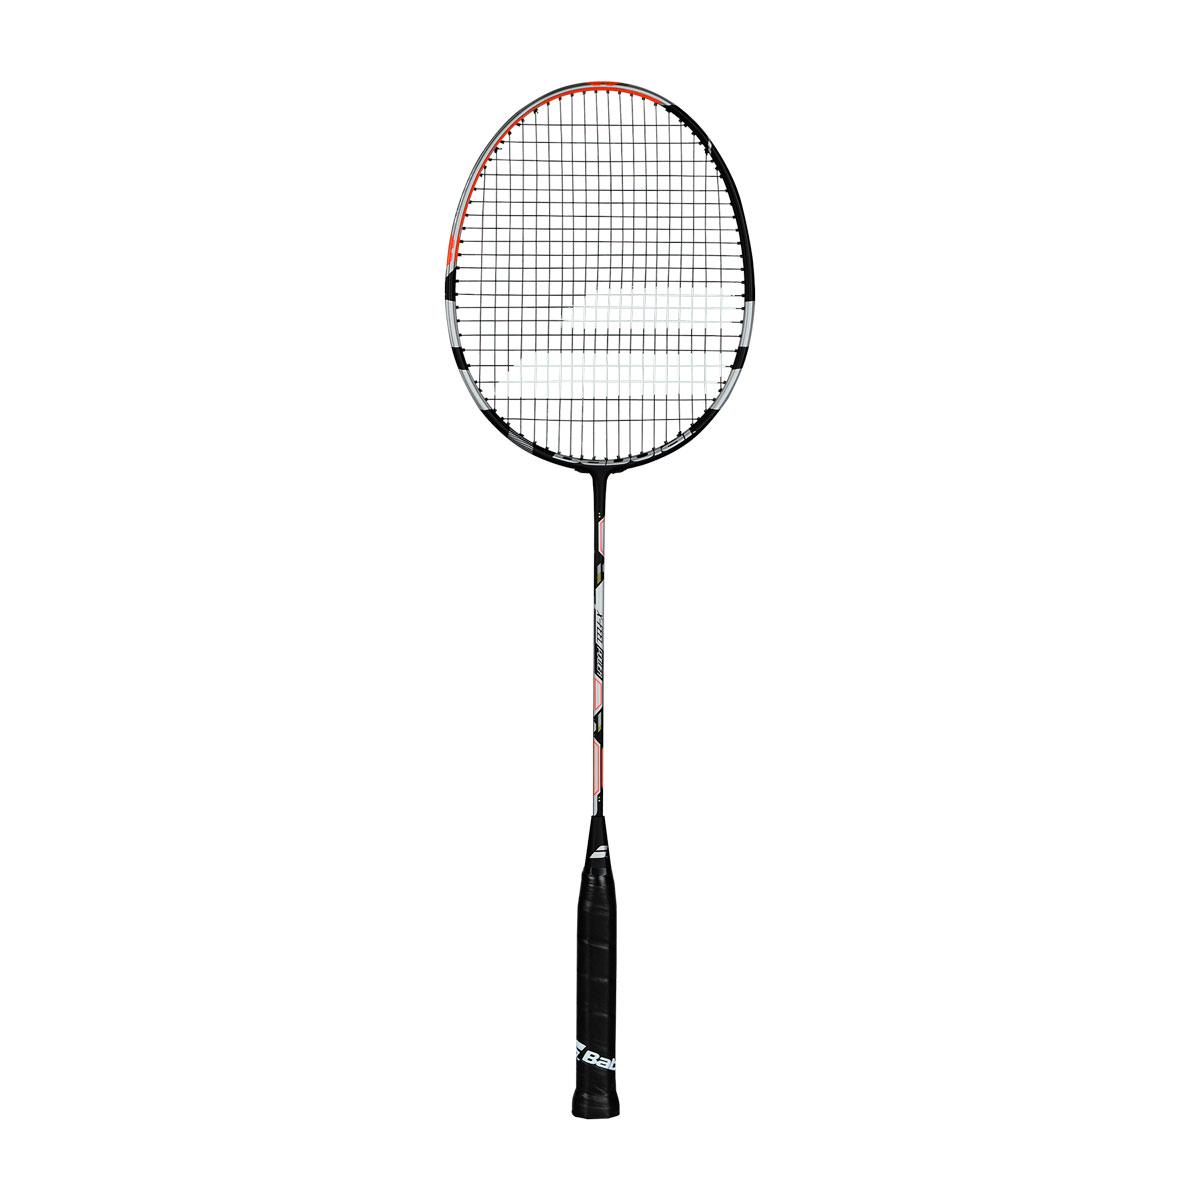 Babolat - X-Feel Power - Badmintonschläger - unbesaitetDetailbild - 0